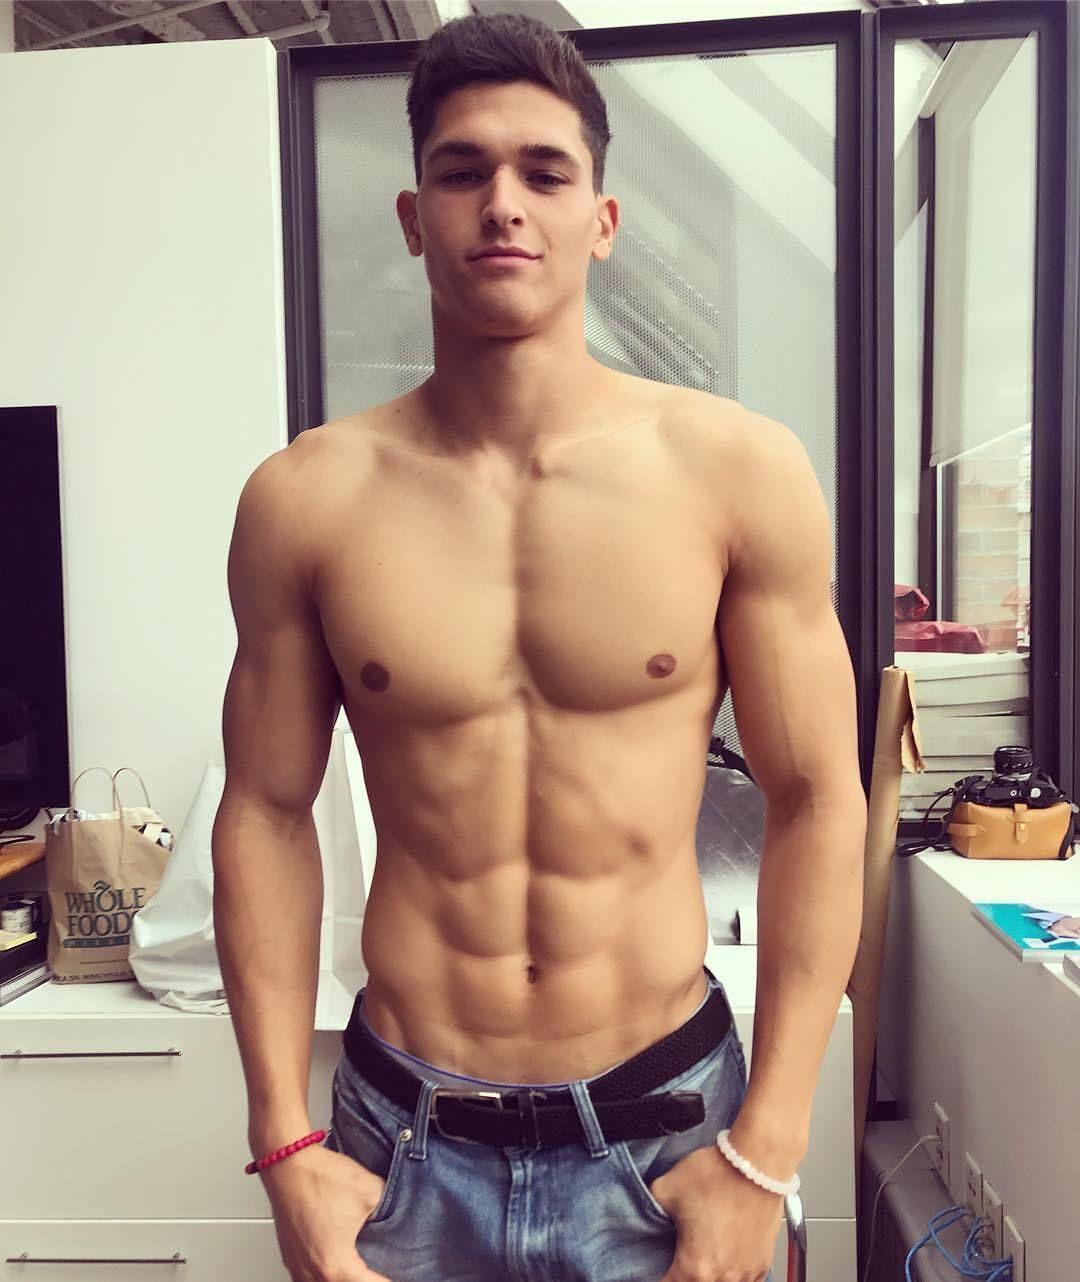 chaud latino gay sexe gratuit pleine longueur hardcore porno